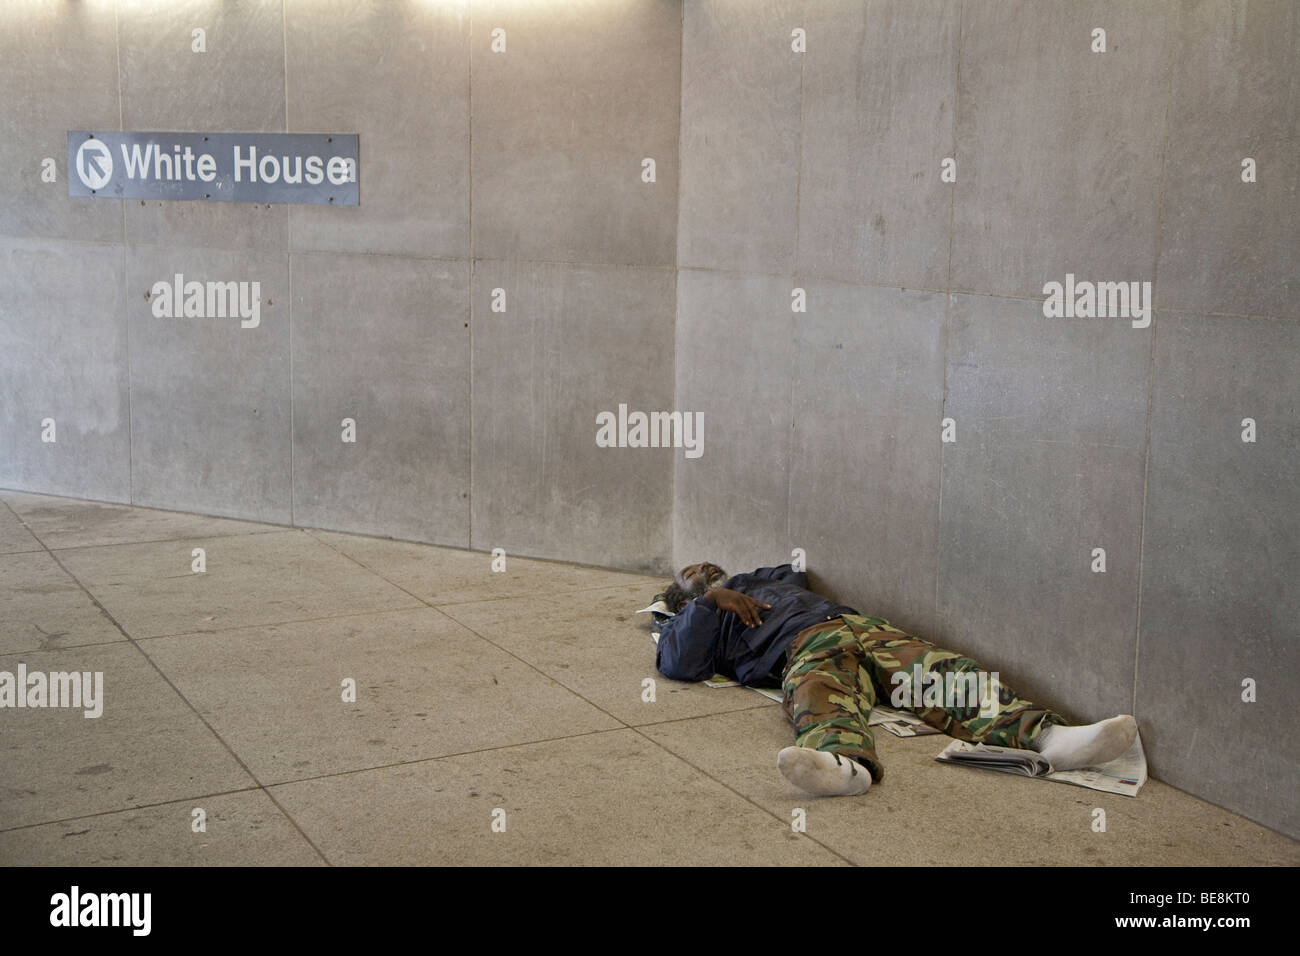 Washington, DC - A homeless man sleeps at the entrance to a Metro subway station near the White House. - Stock Image